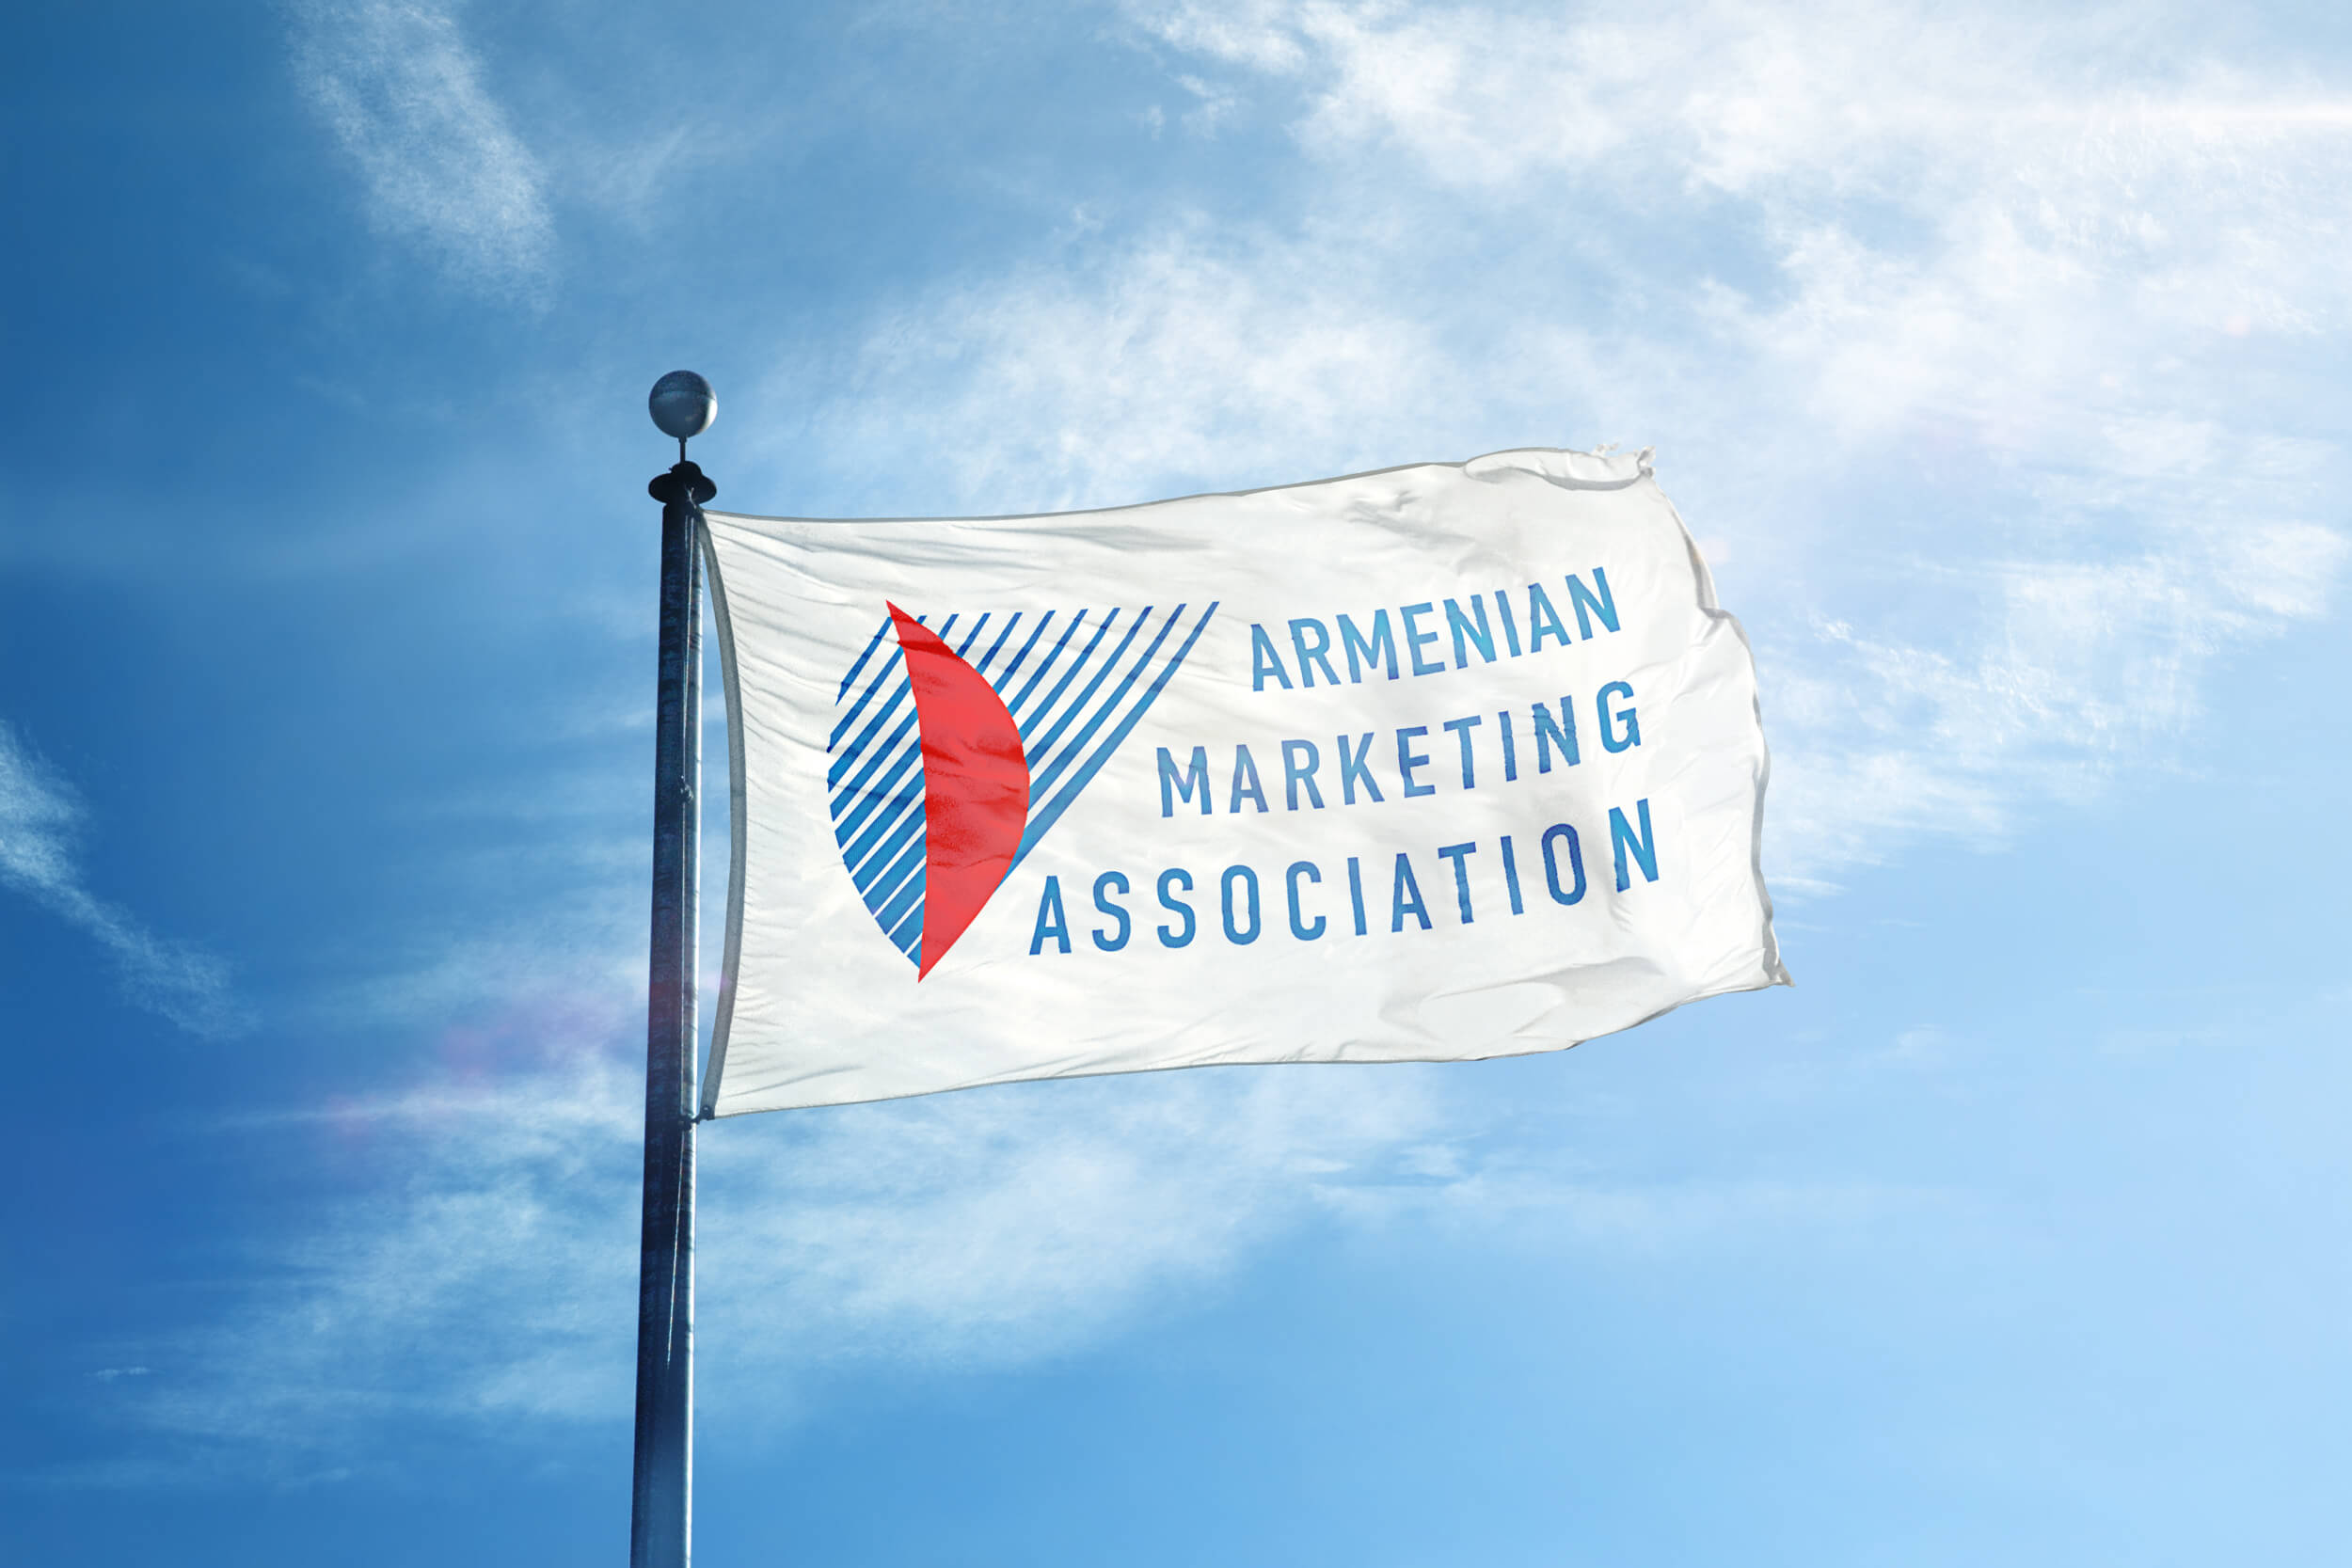 Логотип Армянской Ассоциации Маркетинга, версия 1.1